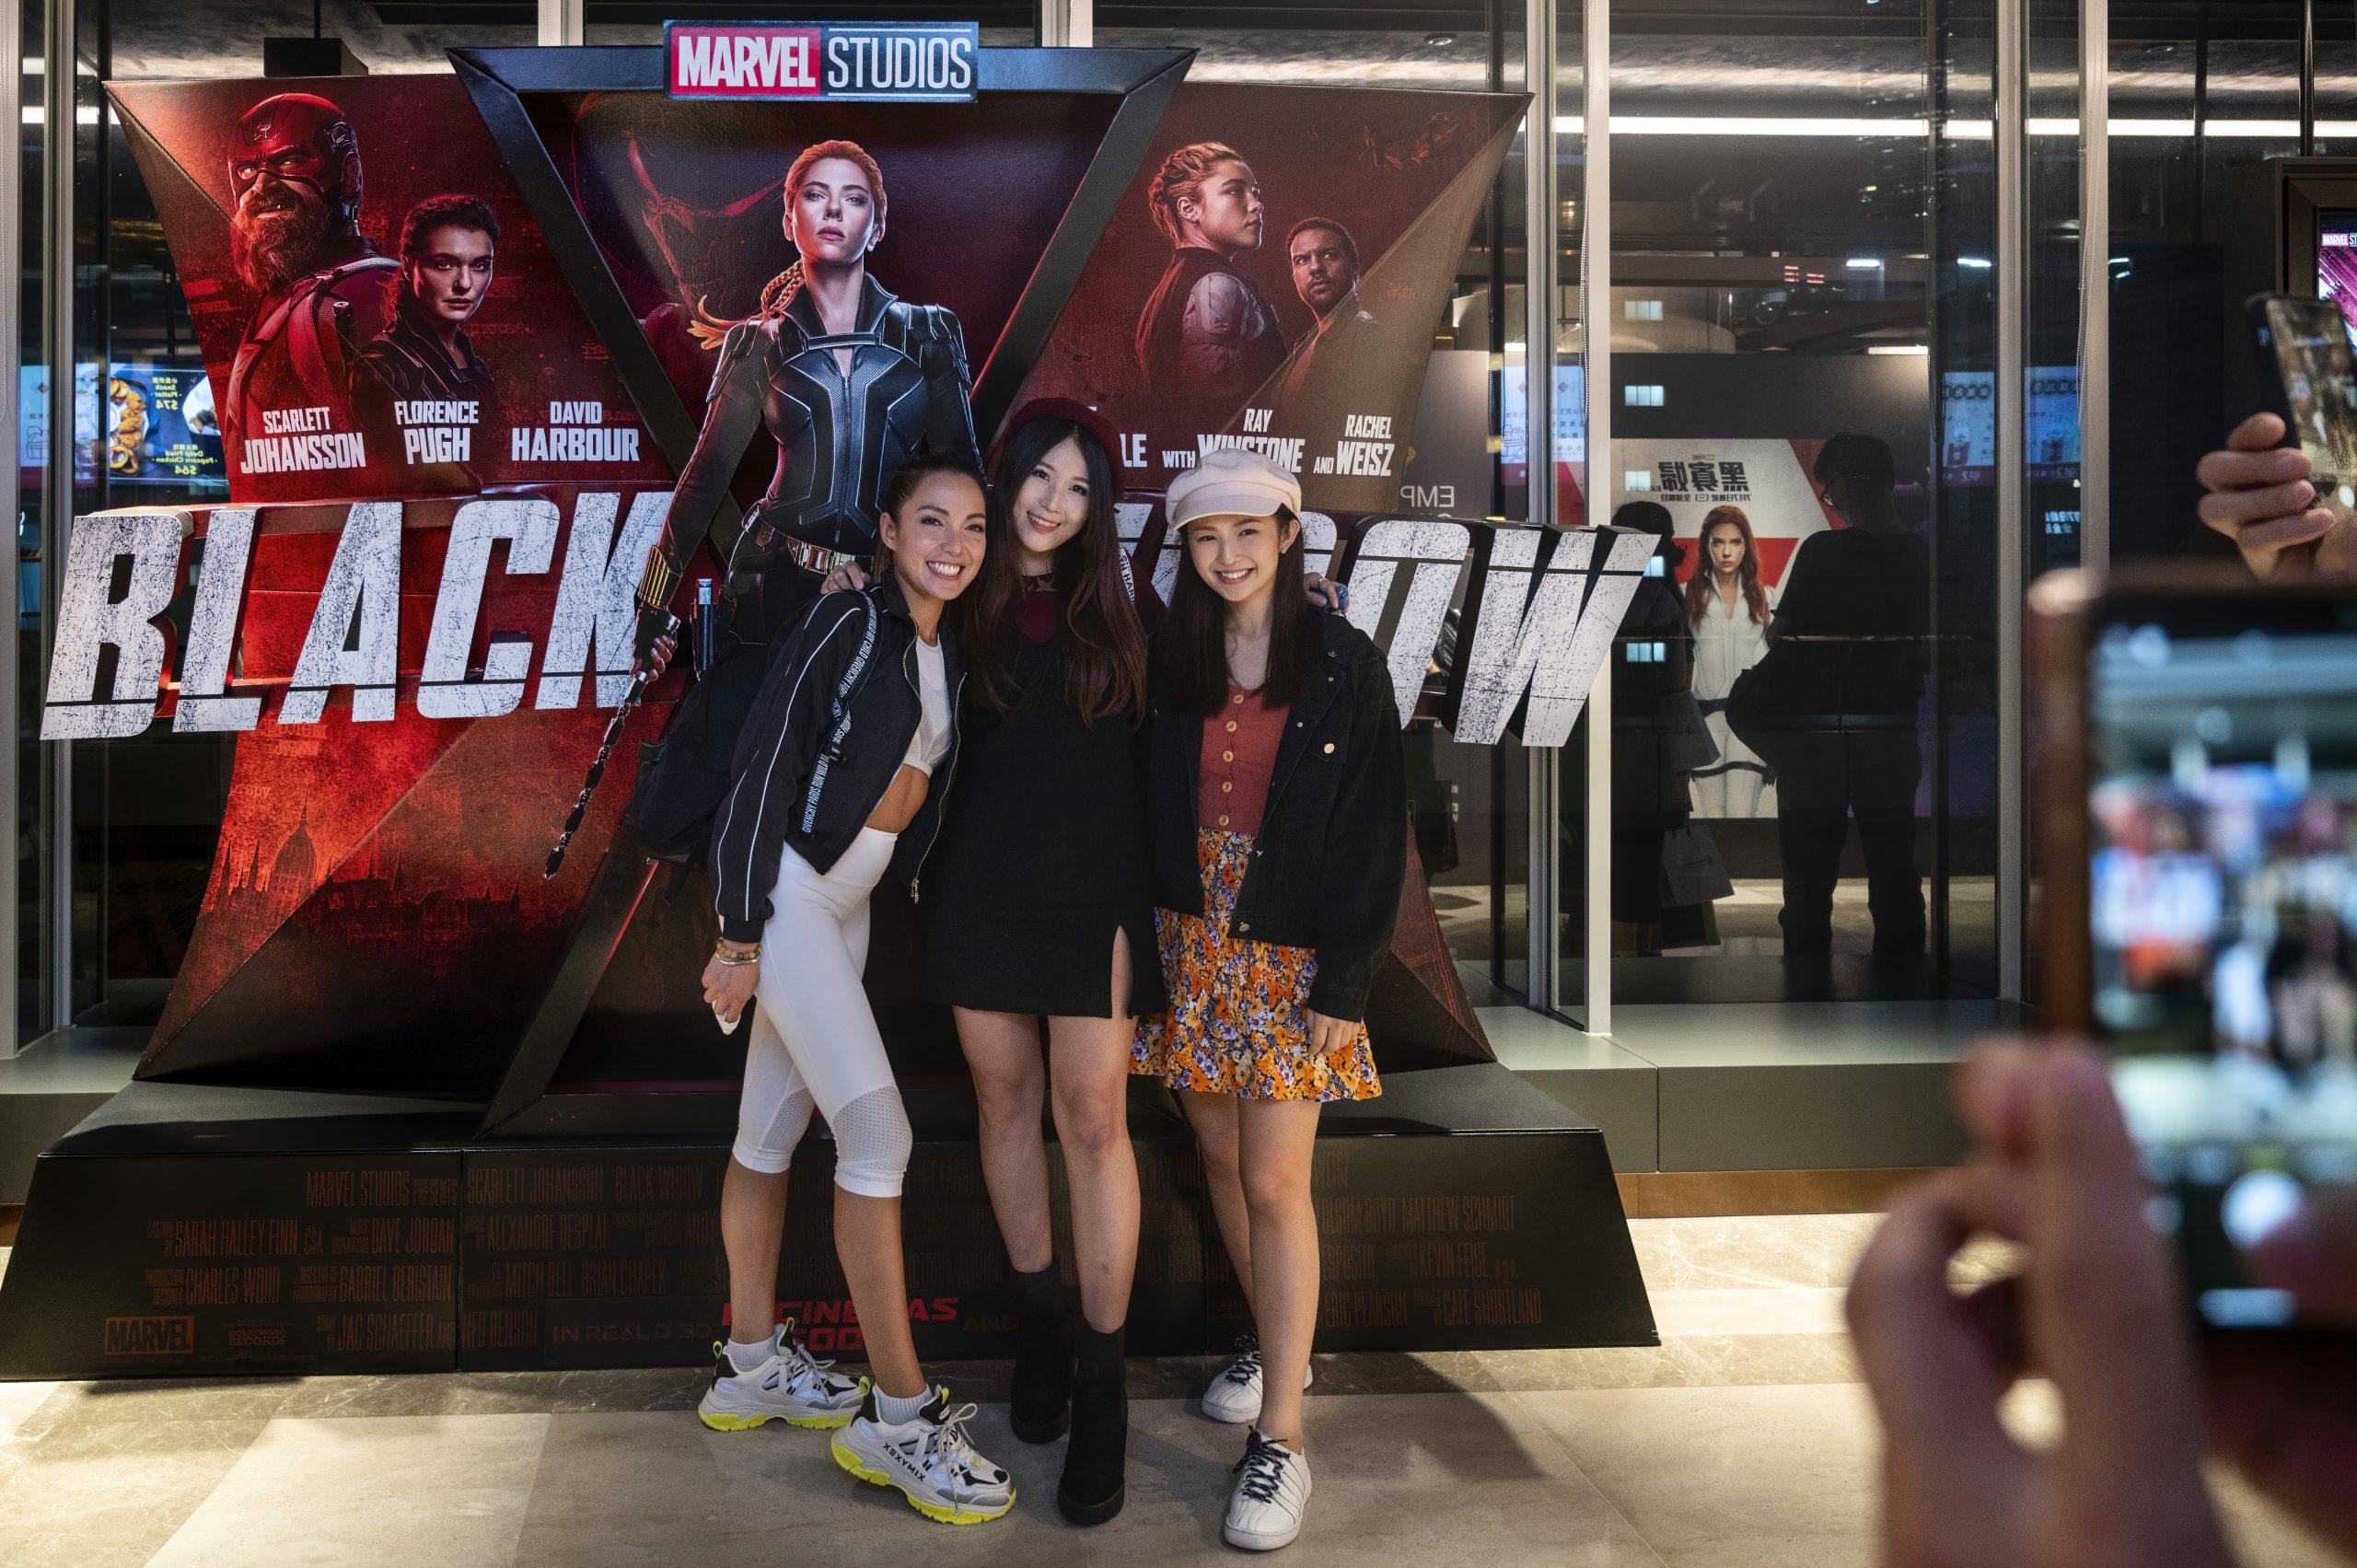 Spectators Pose In Front Of Disney's And Marvel Studios